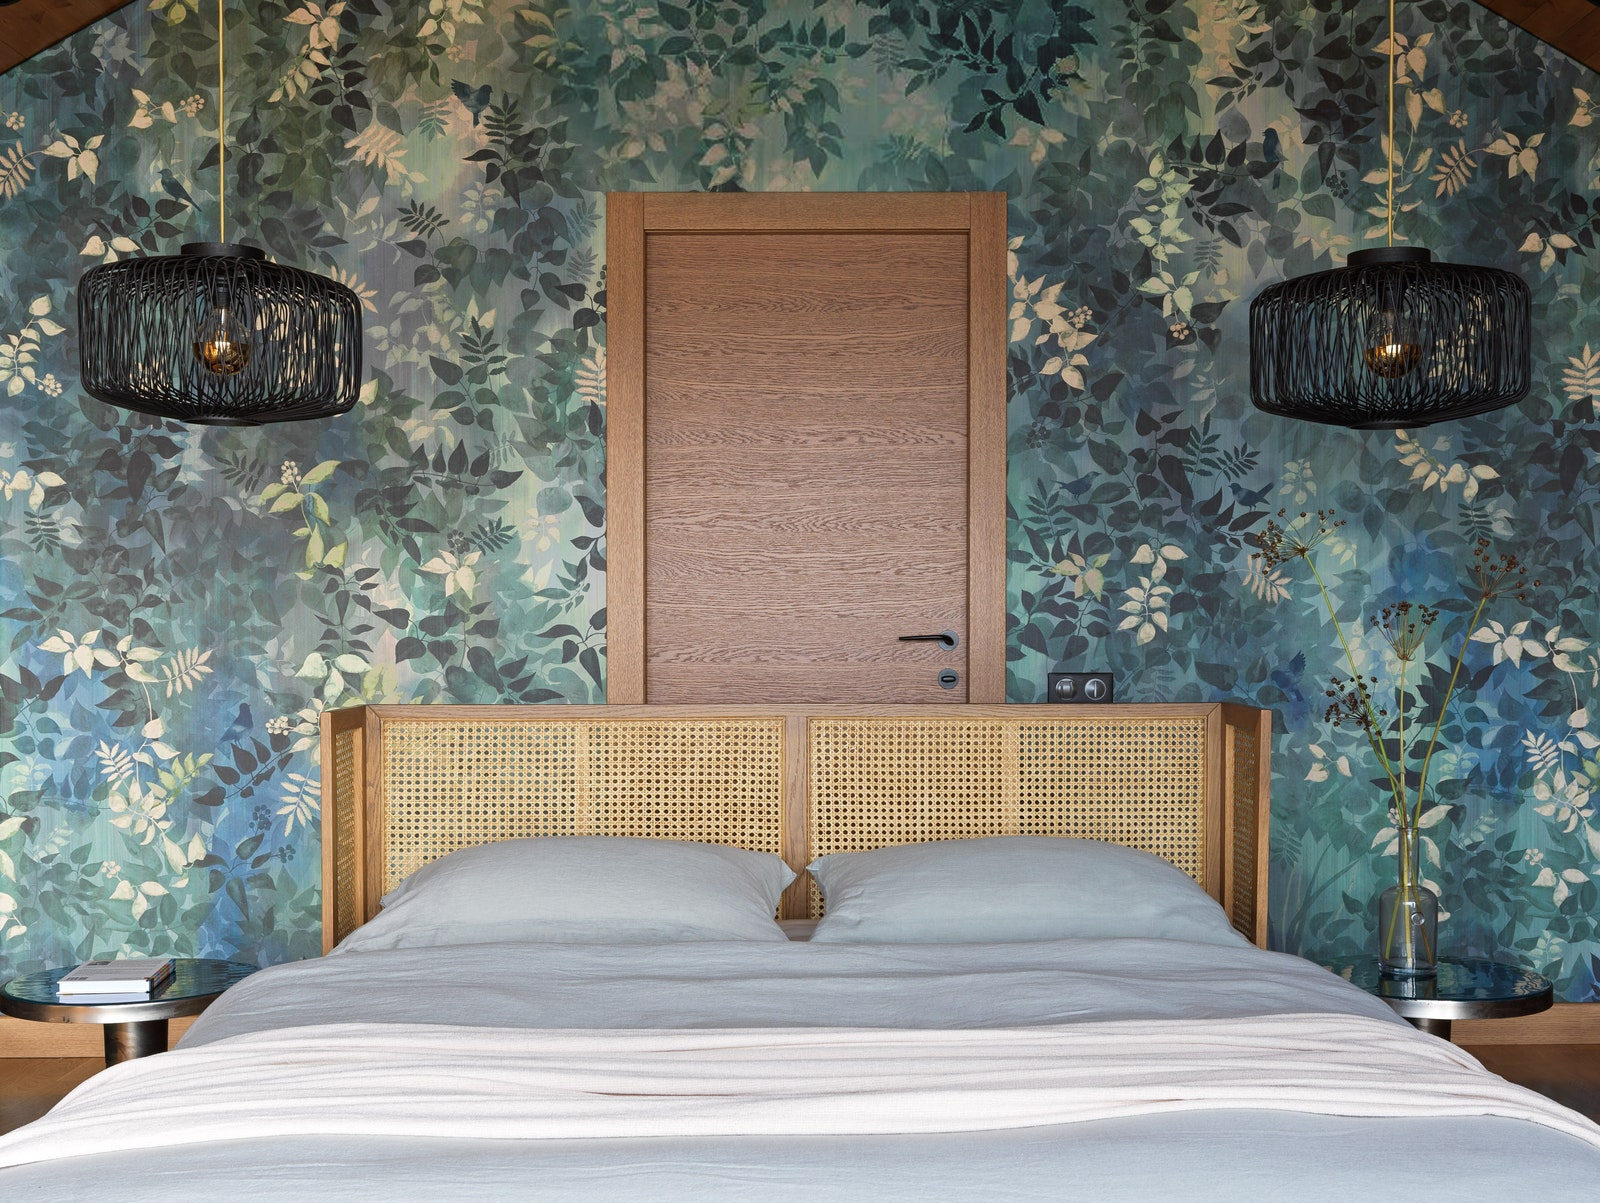 .     La Redoute   Lissoy  Predmety Shop  Zara Home   Done Deco  Atelier Home.    Affresco  .